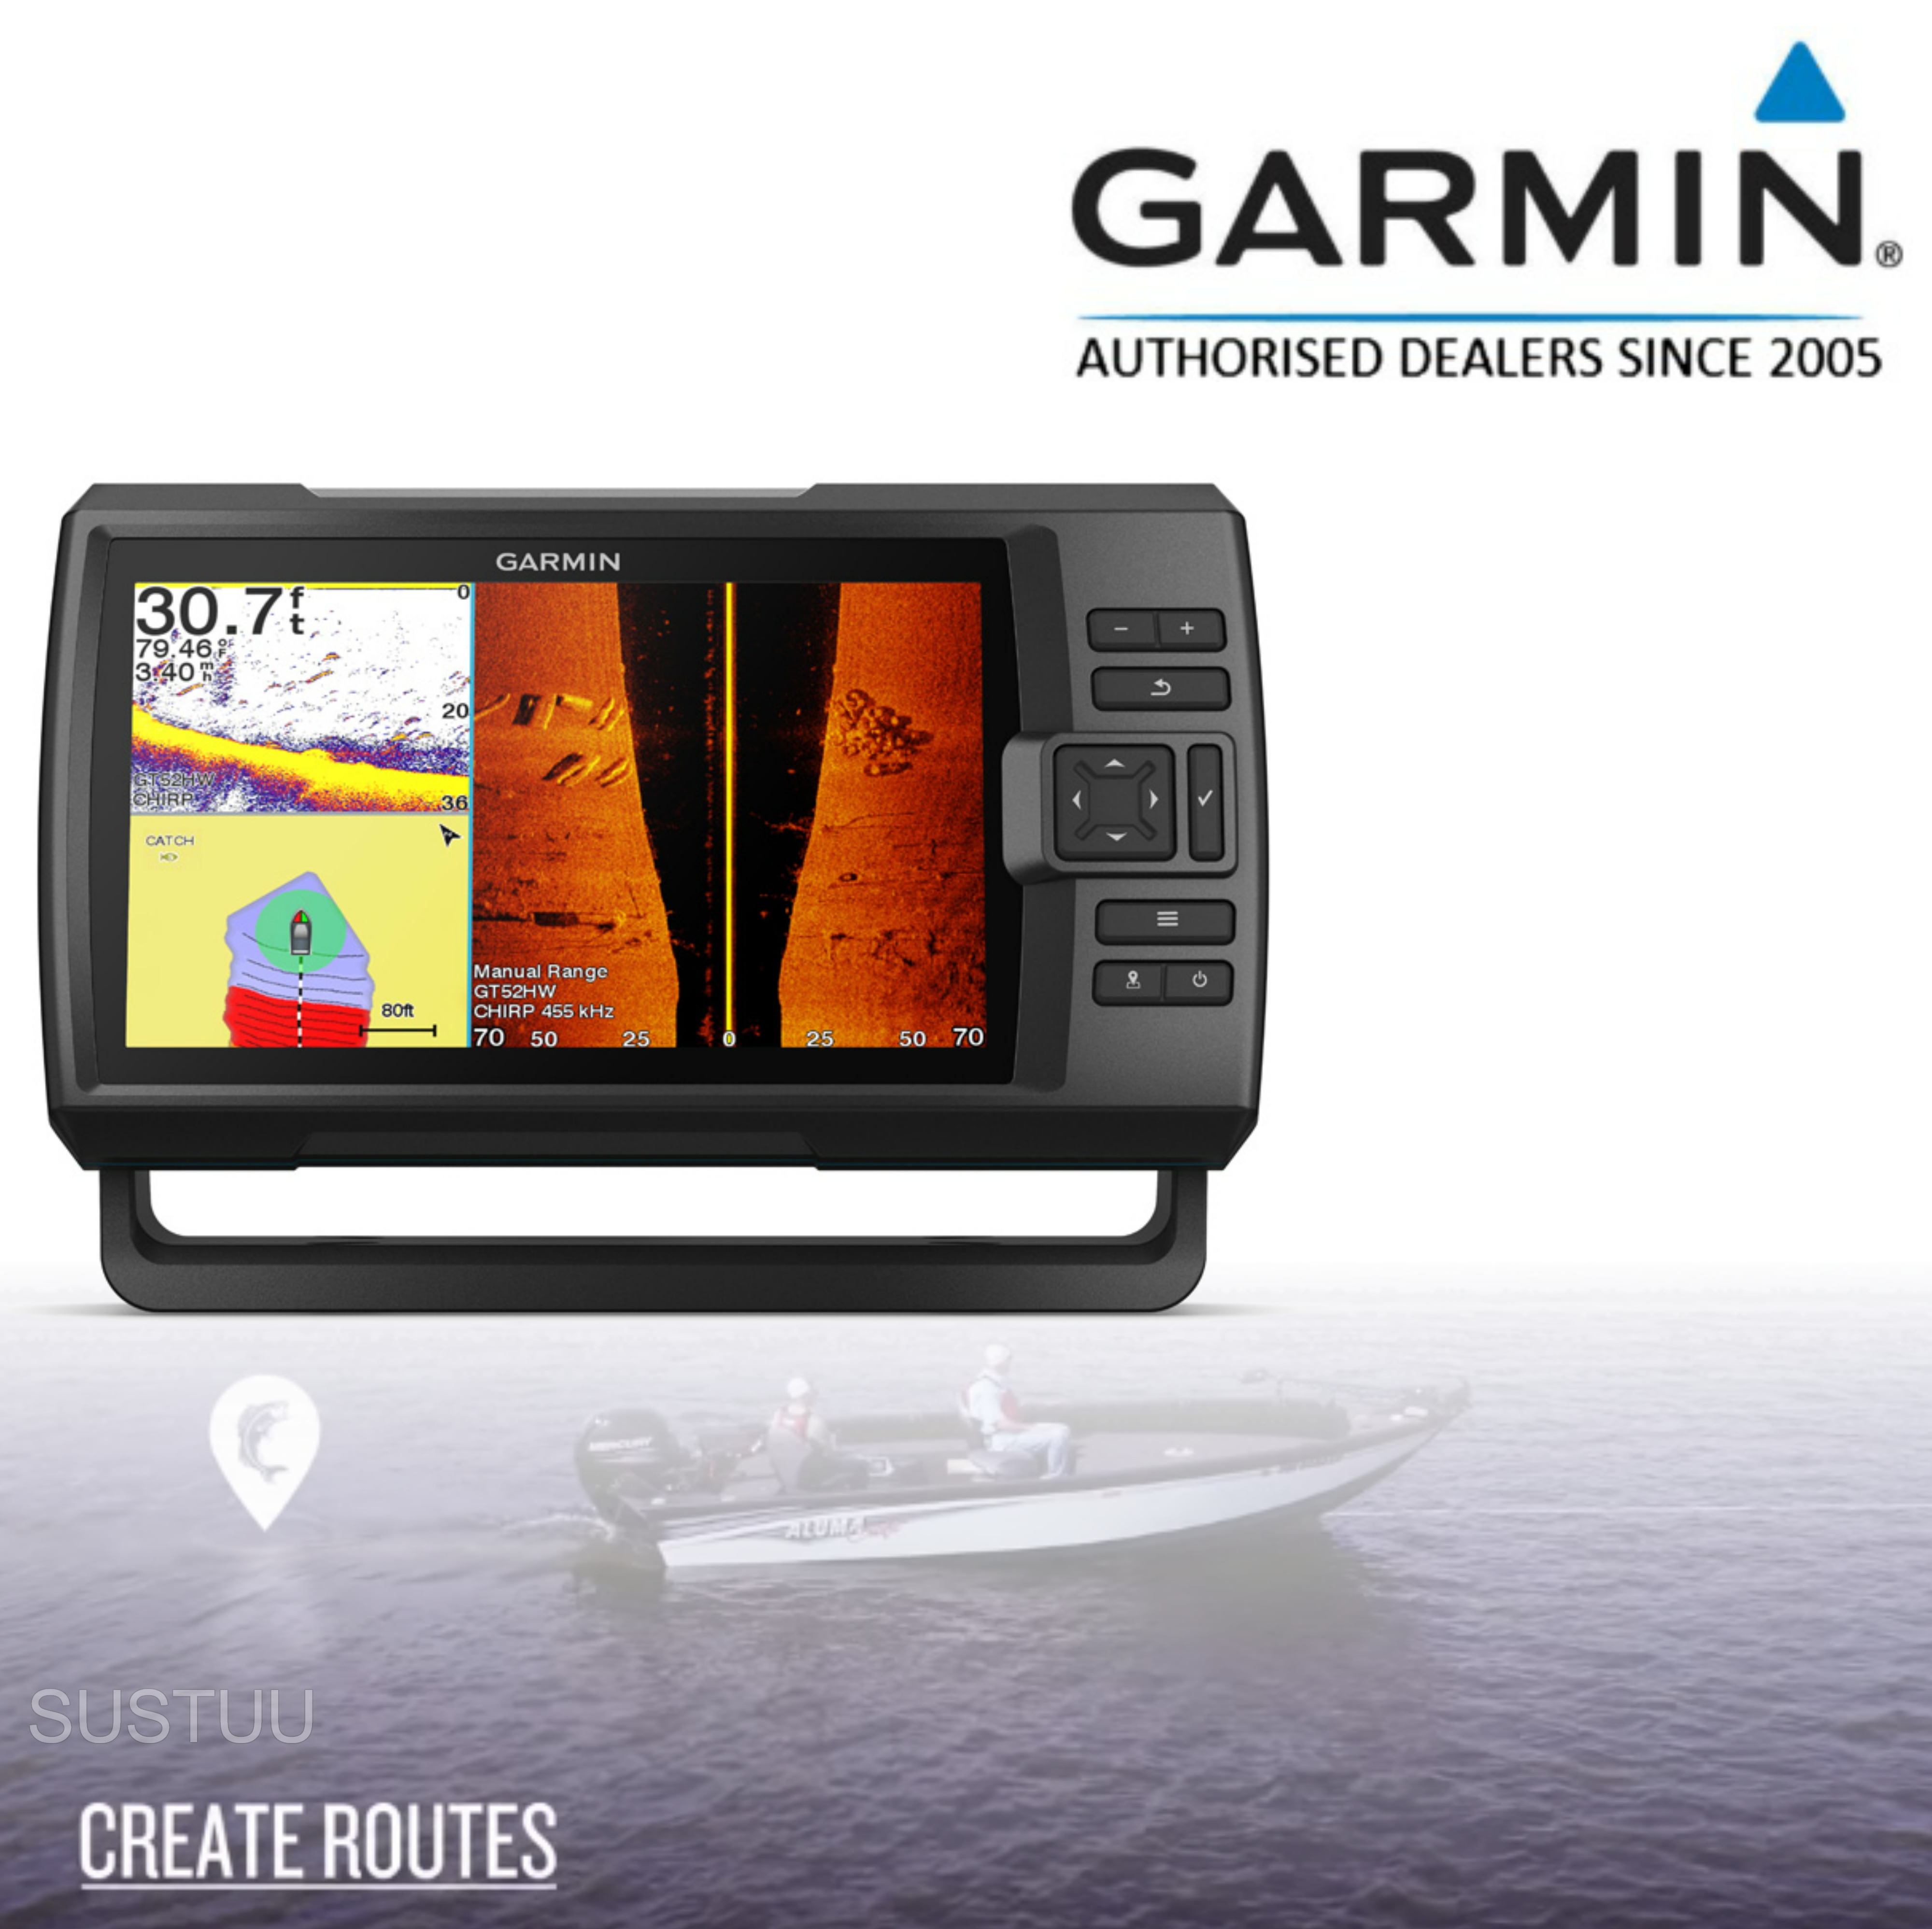 "Garmin STRIKER Plus 9sv- 9"" & GT52HW-TM Transom Transducer|GPS Fish Finder|Boat & Marine Use"